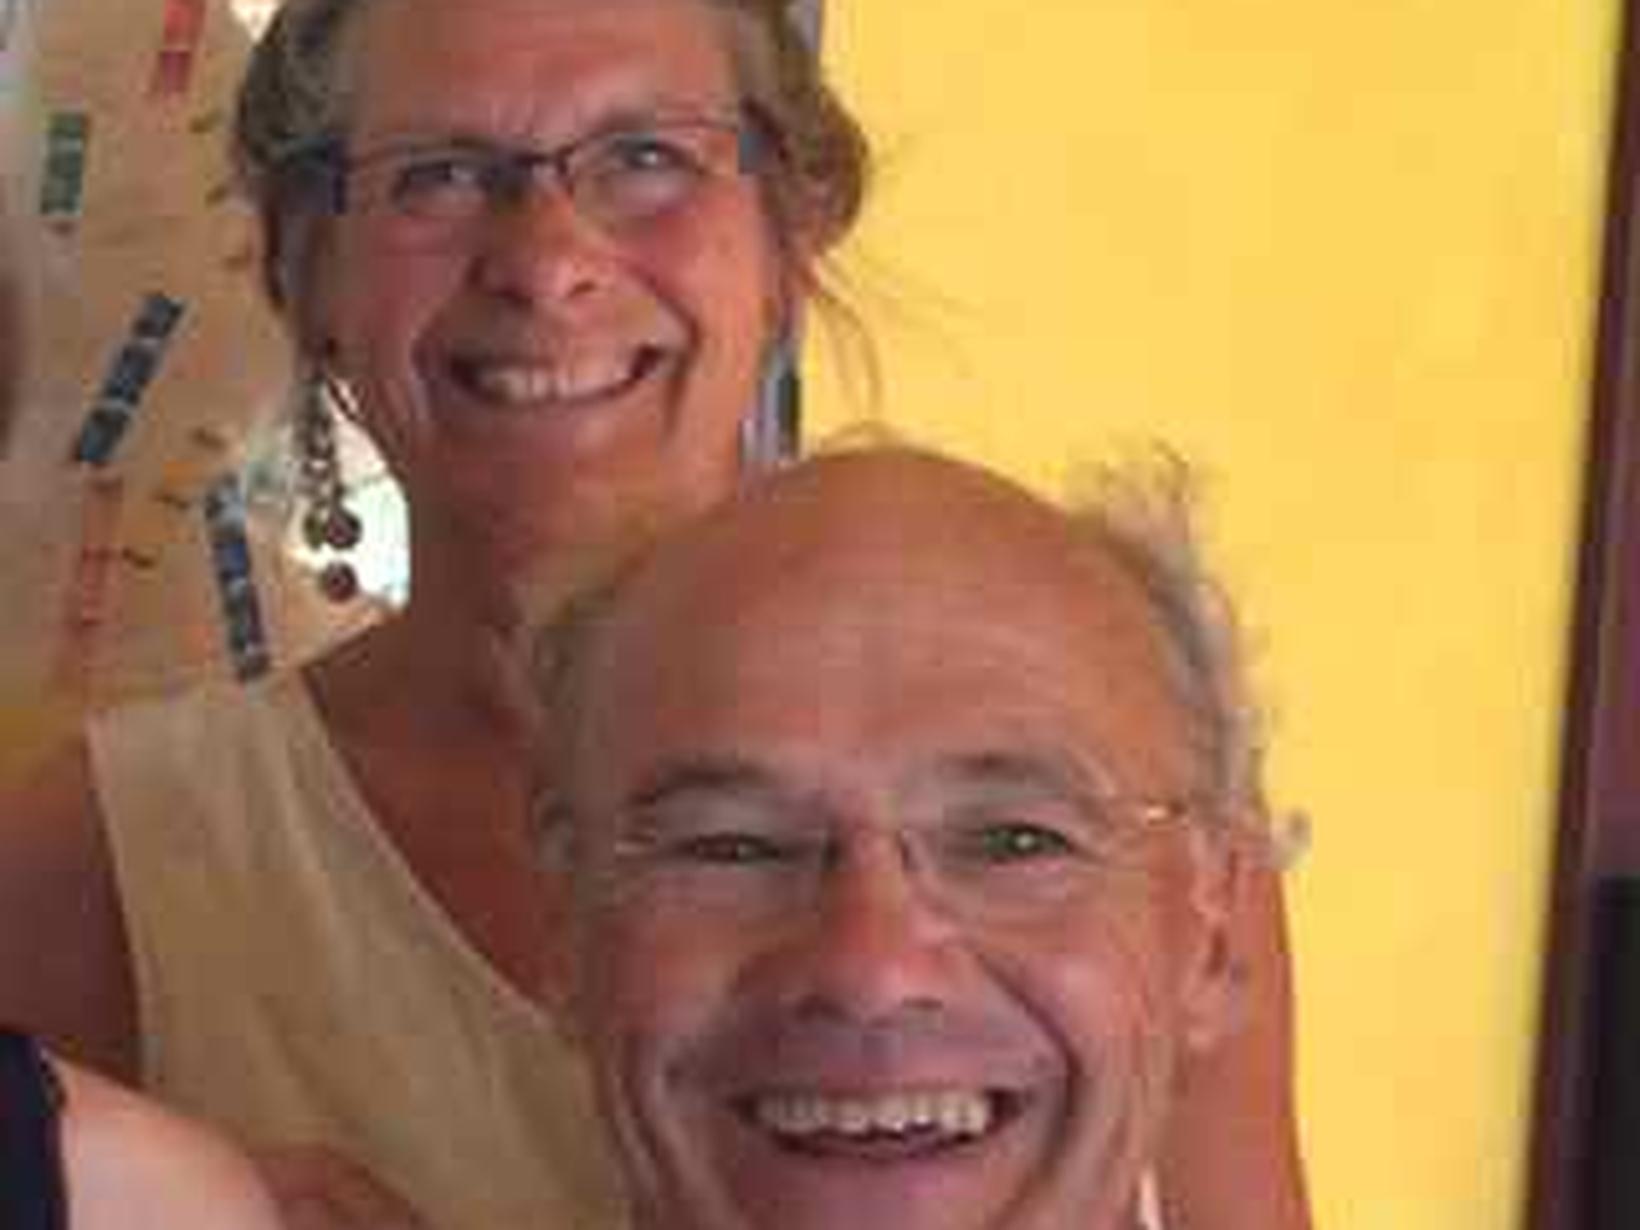 Jane & Matthew from Penticton, British Columbia, Canada